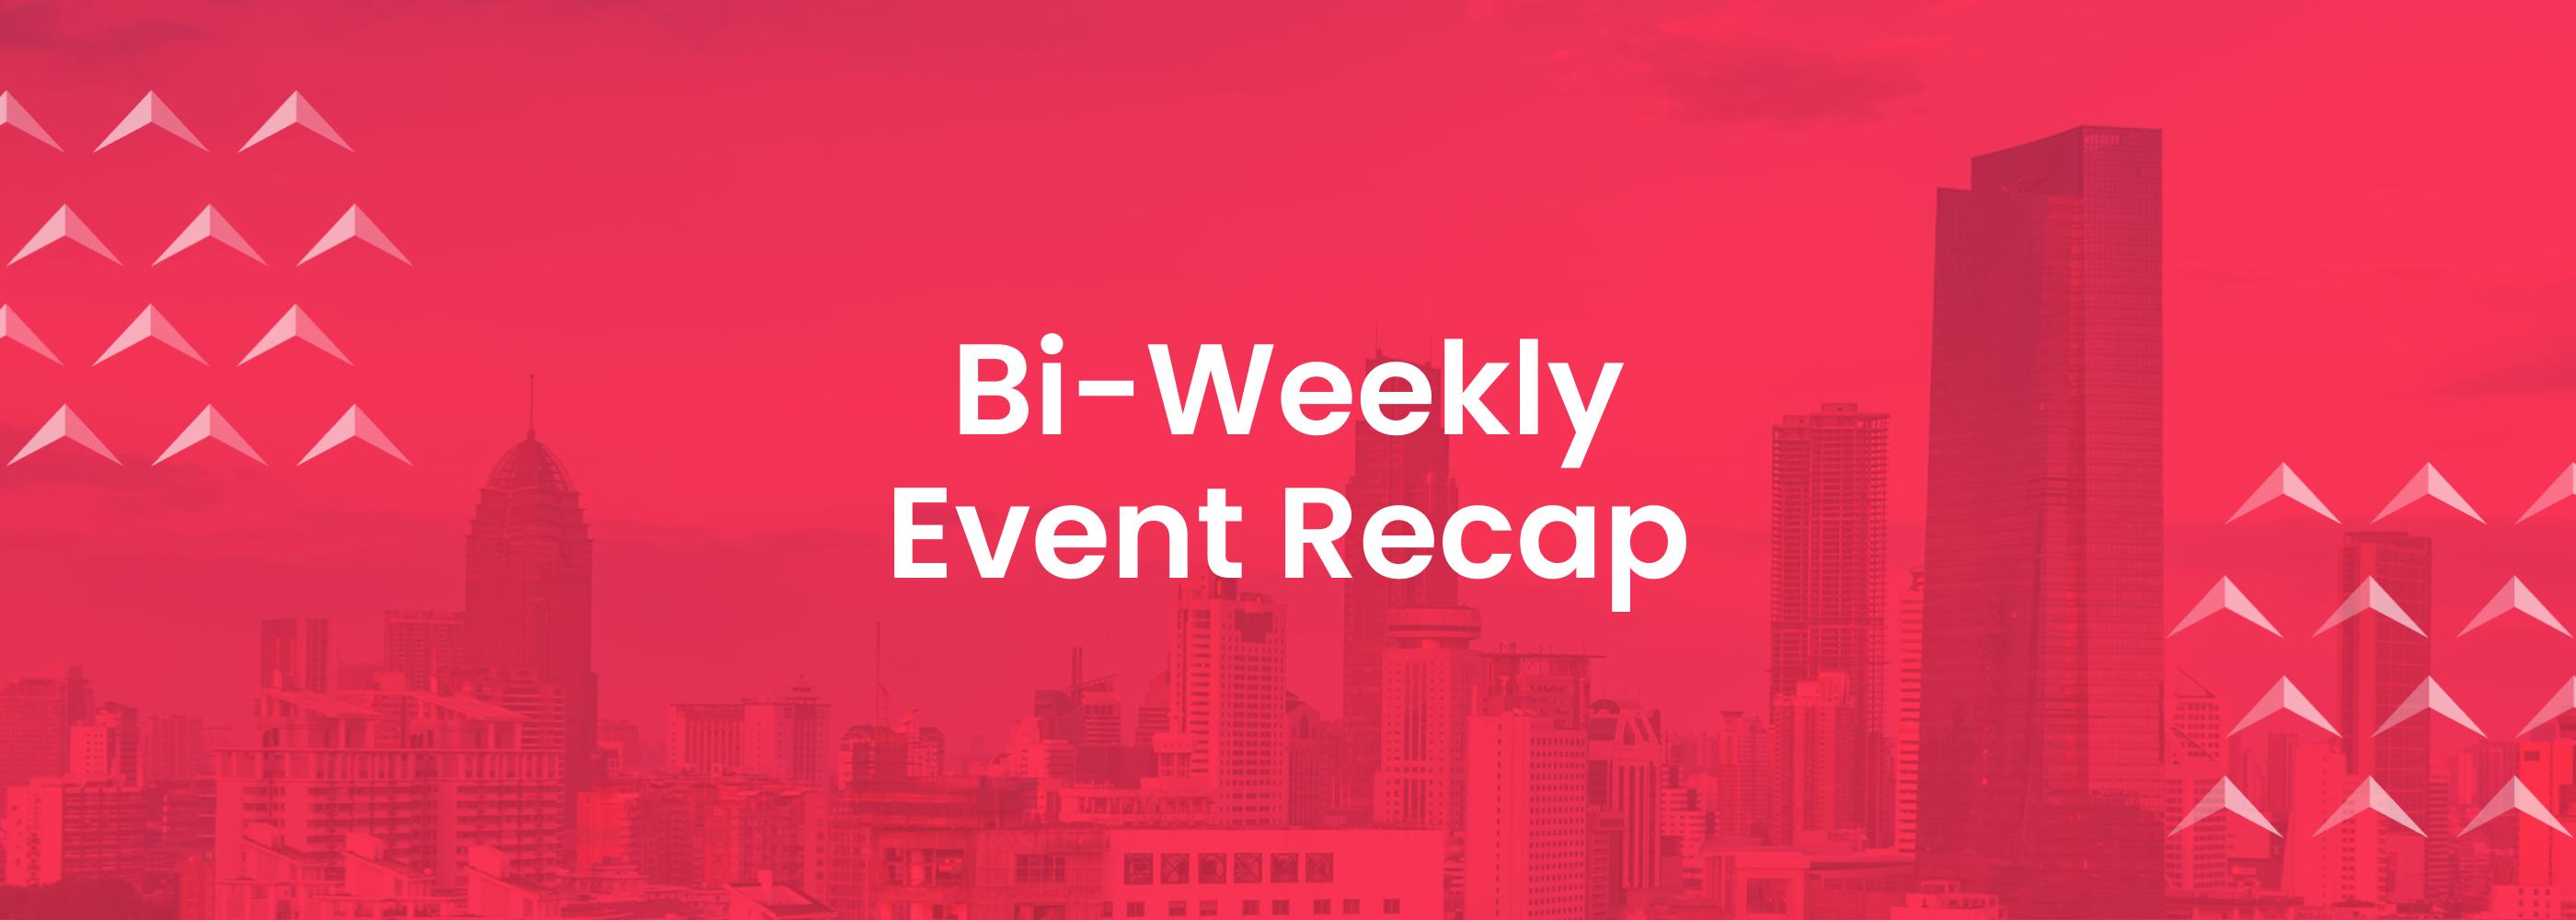 Event Highlights, Event Recap, Events calendar